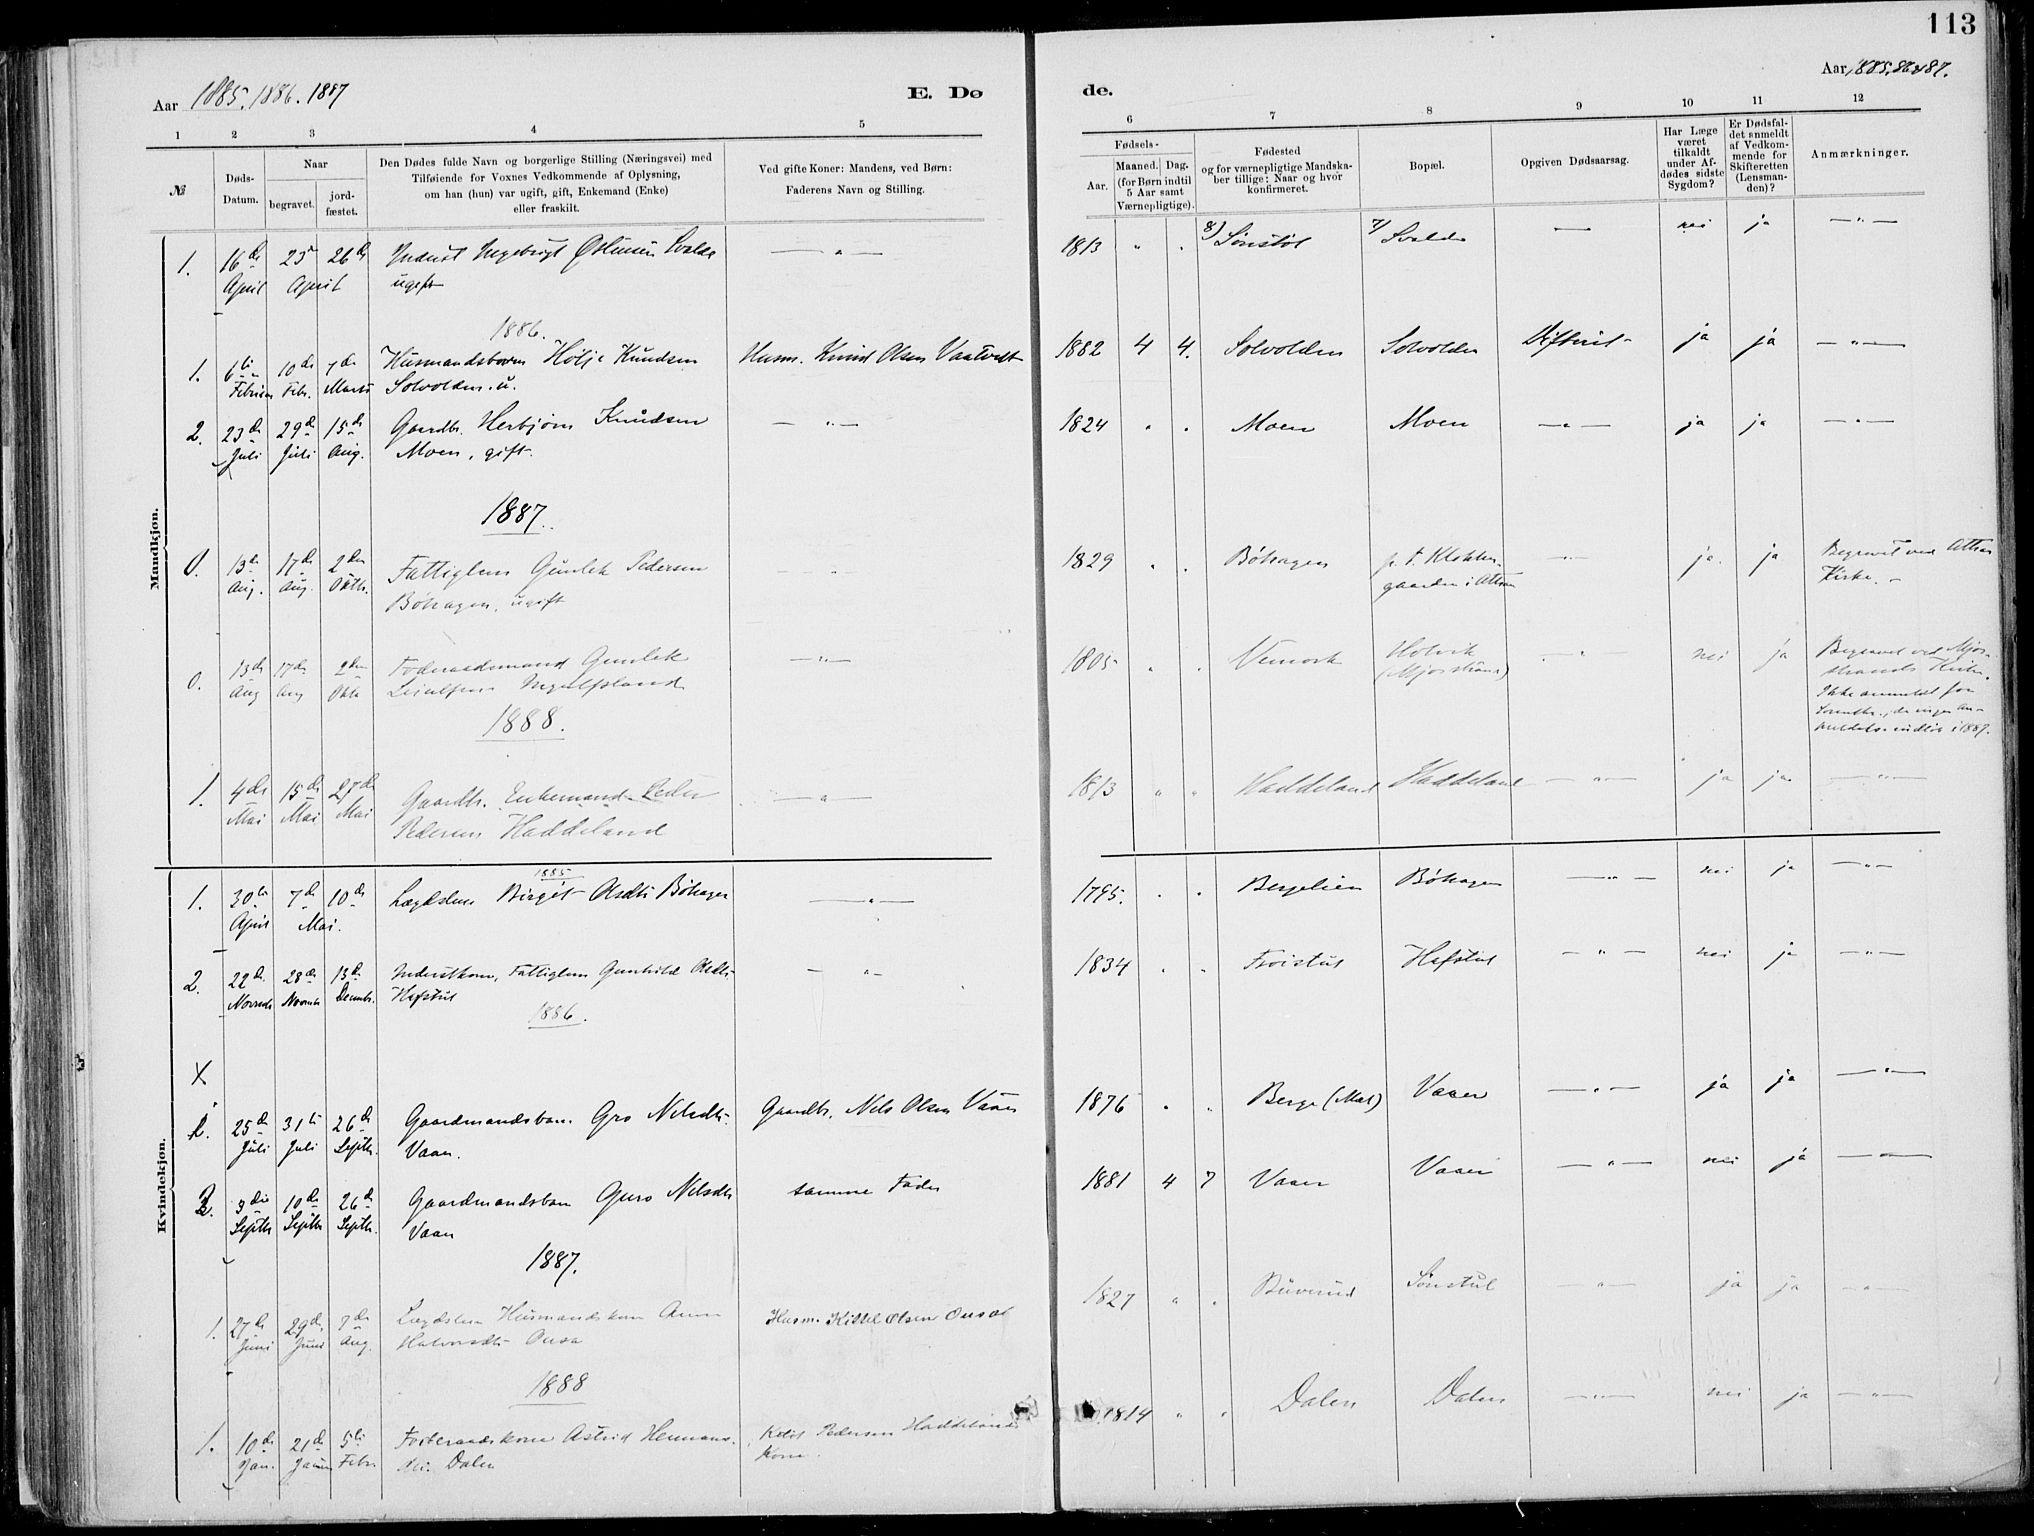 SAKO, Rjukan kirkebøker, F/Fa/L0001: Ministerialbok nr. 1, 1878-1912, s. 113